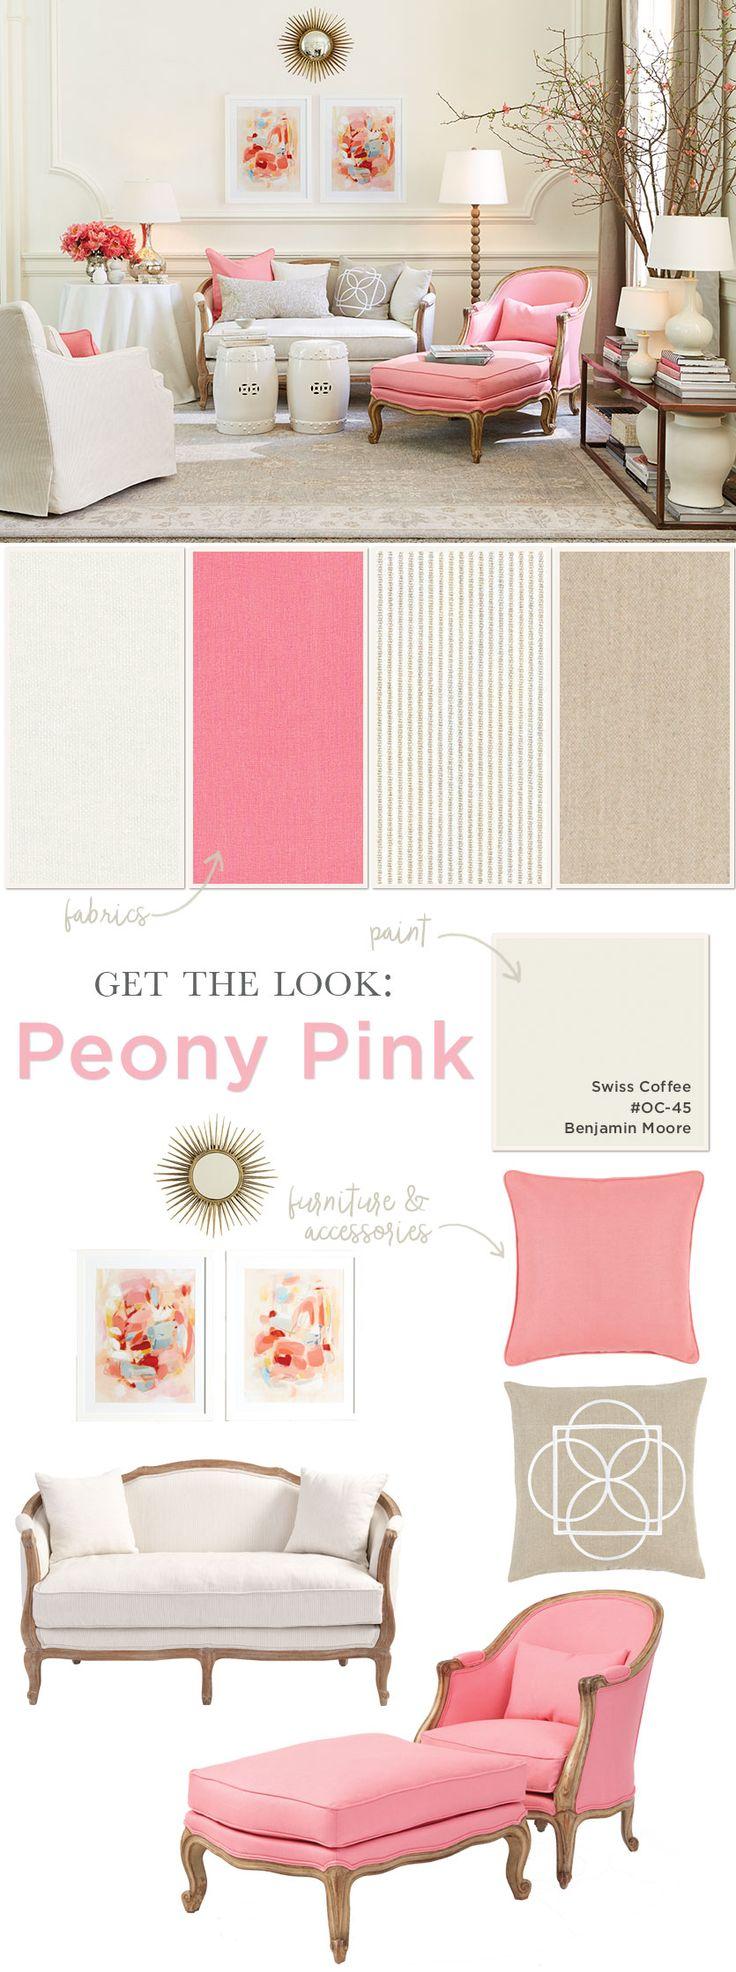 Suzanne Kasler's peony pink living room for Ballard Designs